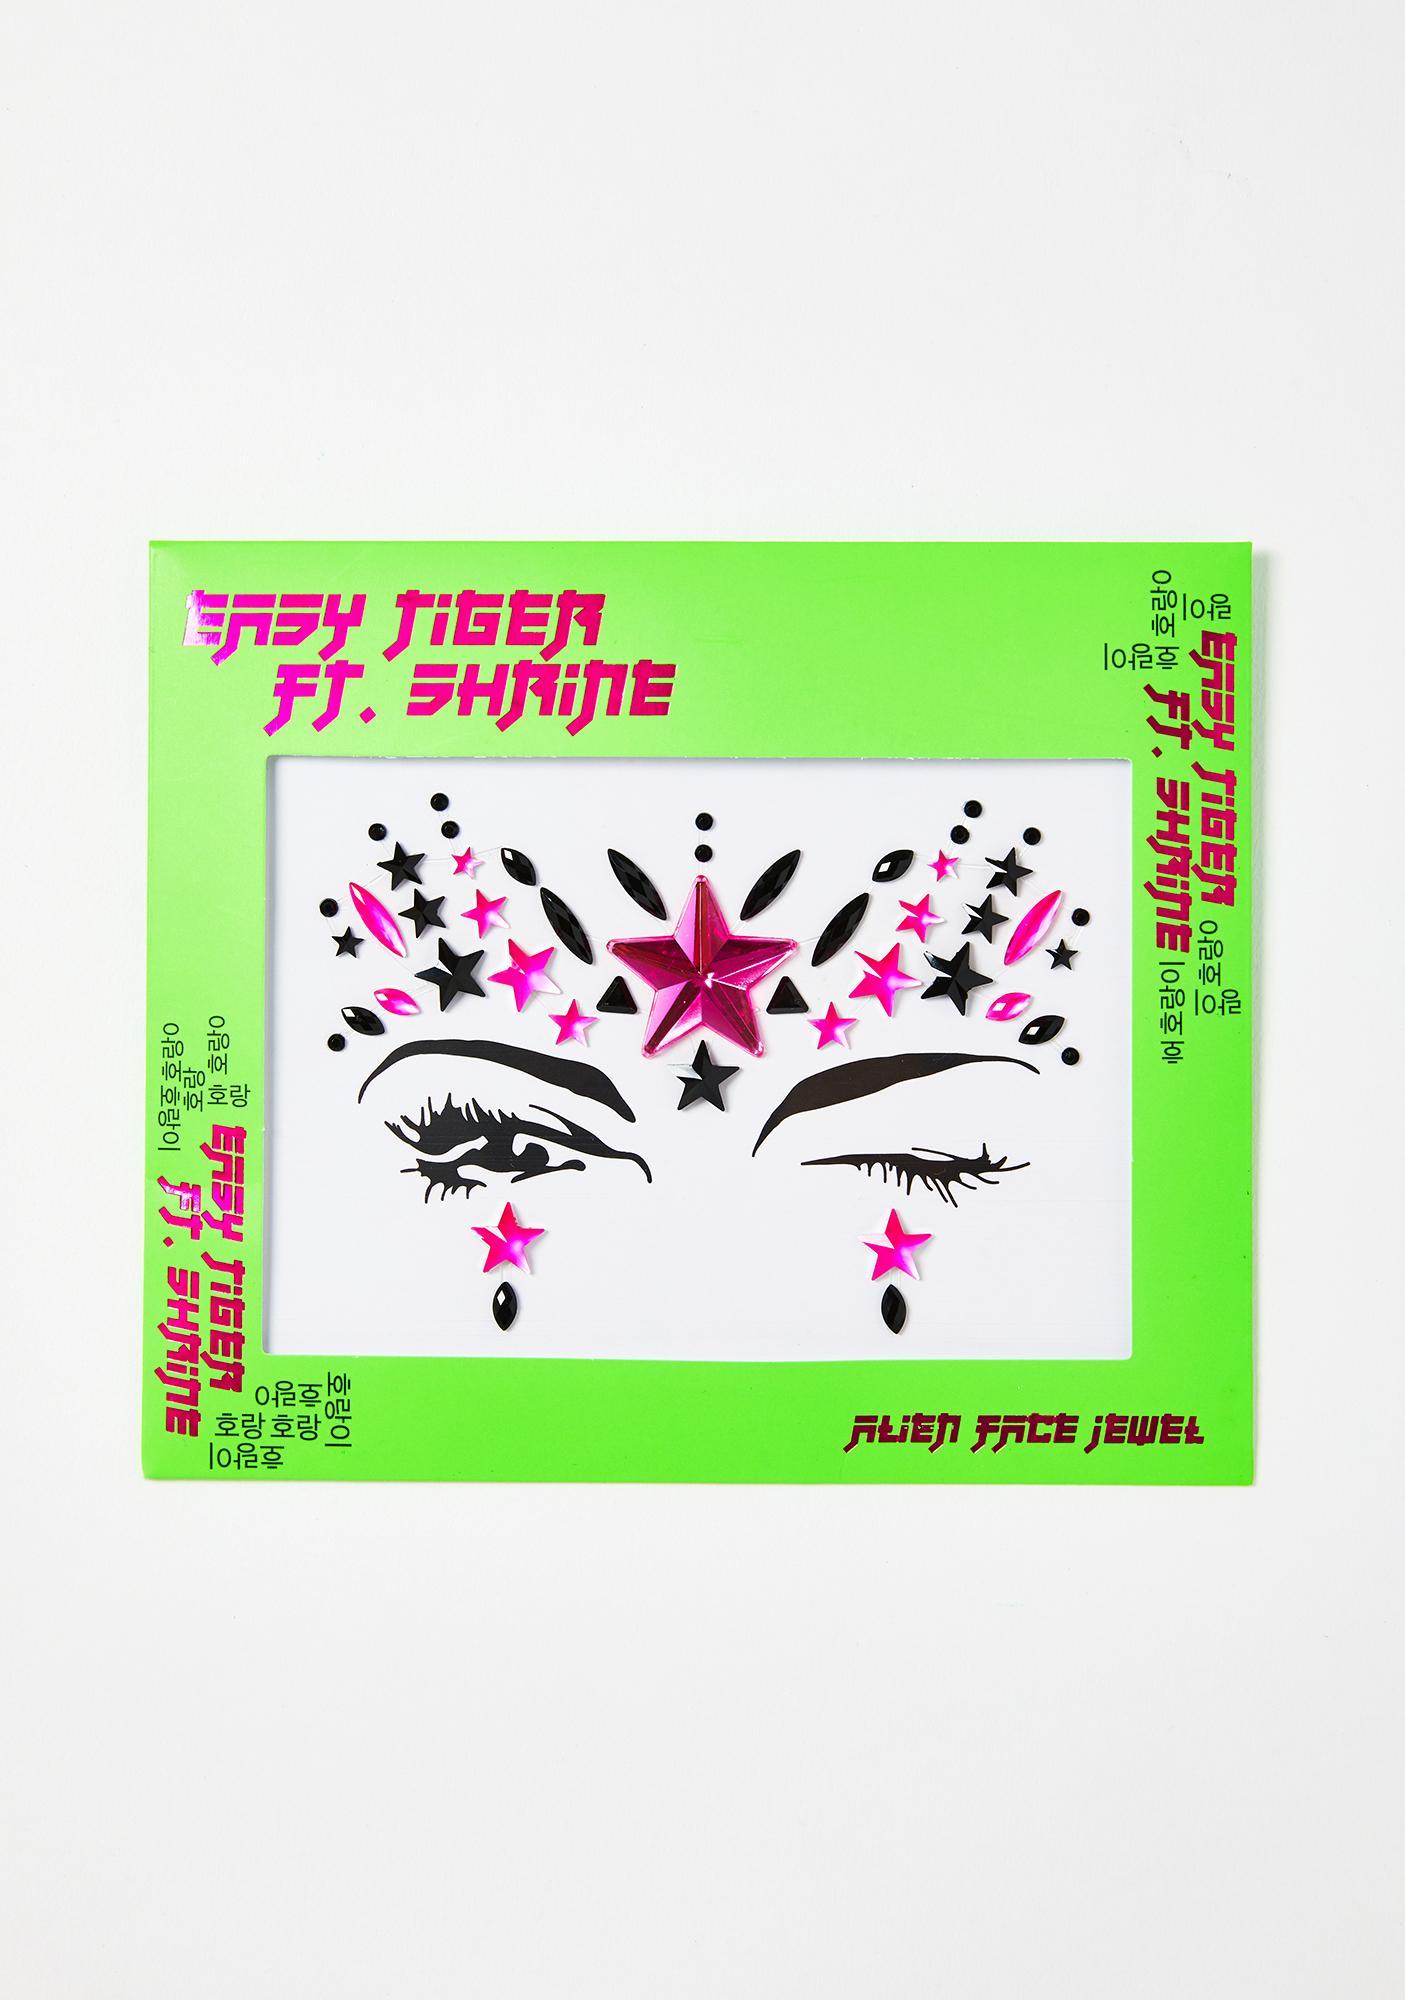 The Gypsy Shrine Neon Pink Alien Face Jewels